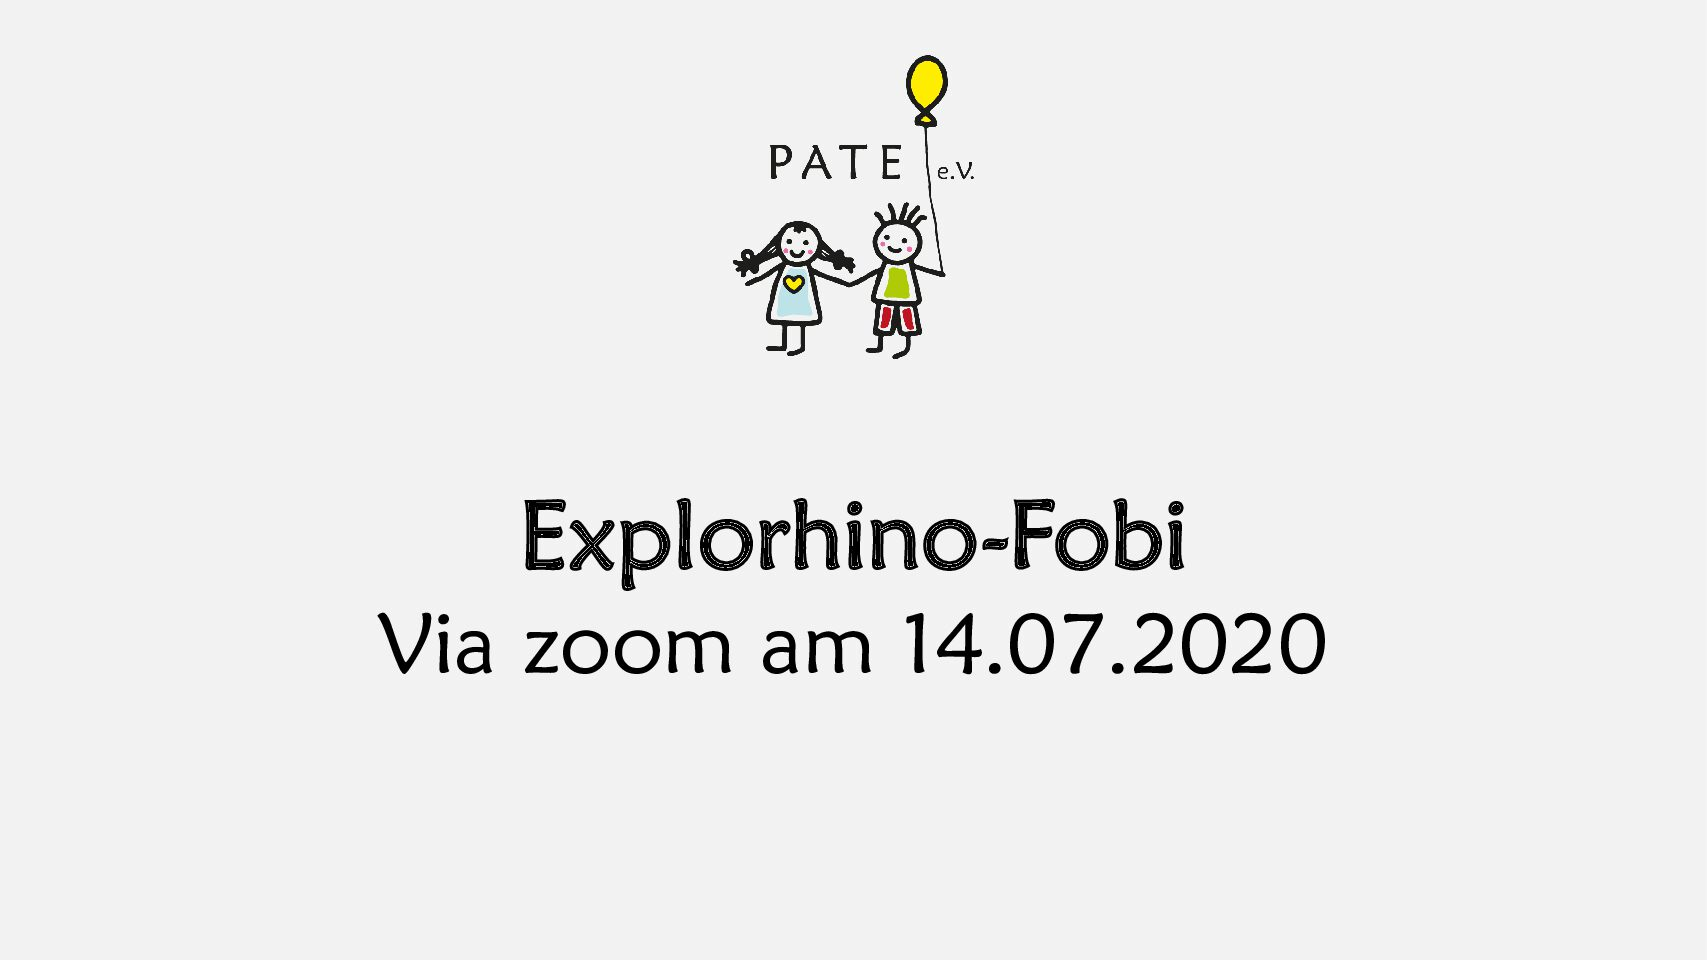 Explorhino-Fortbildung am 14.07.2020